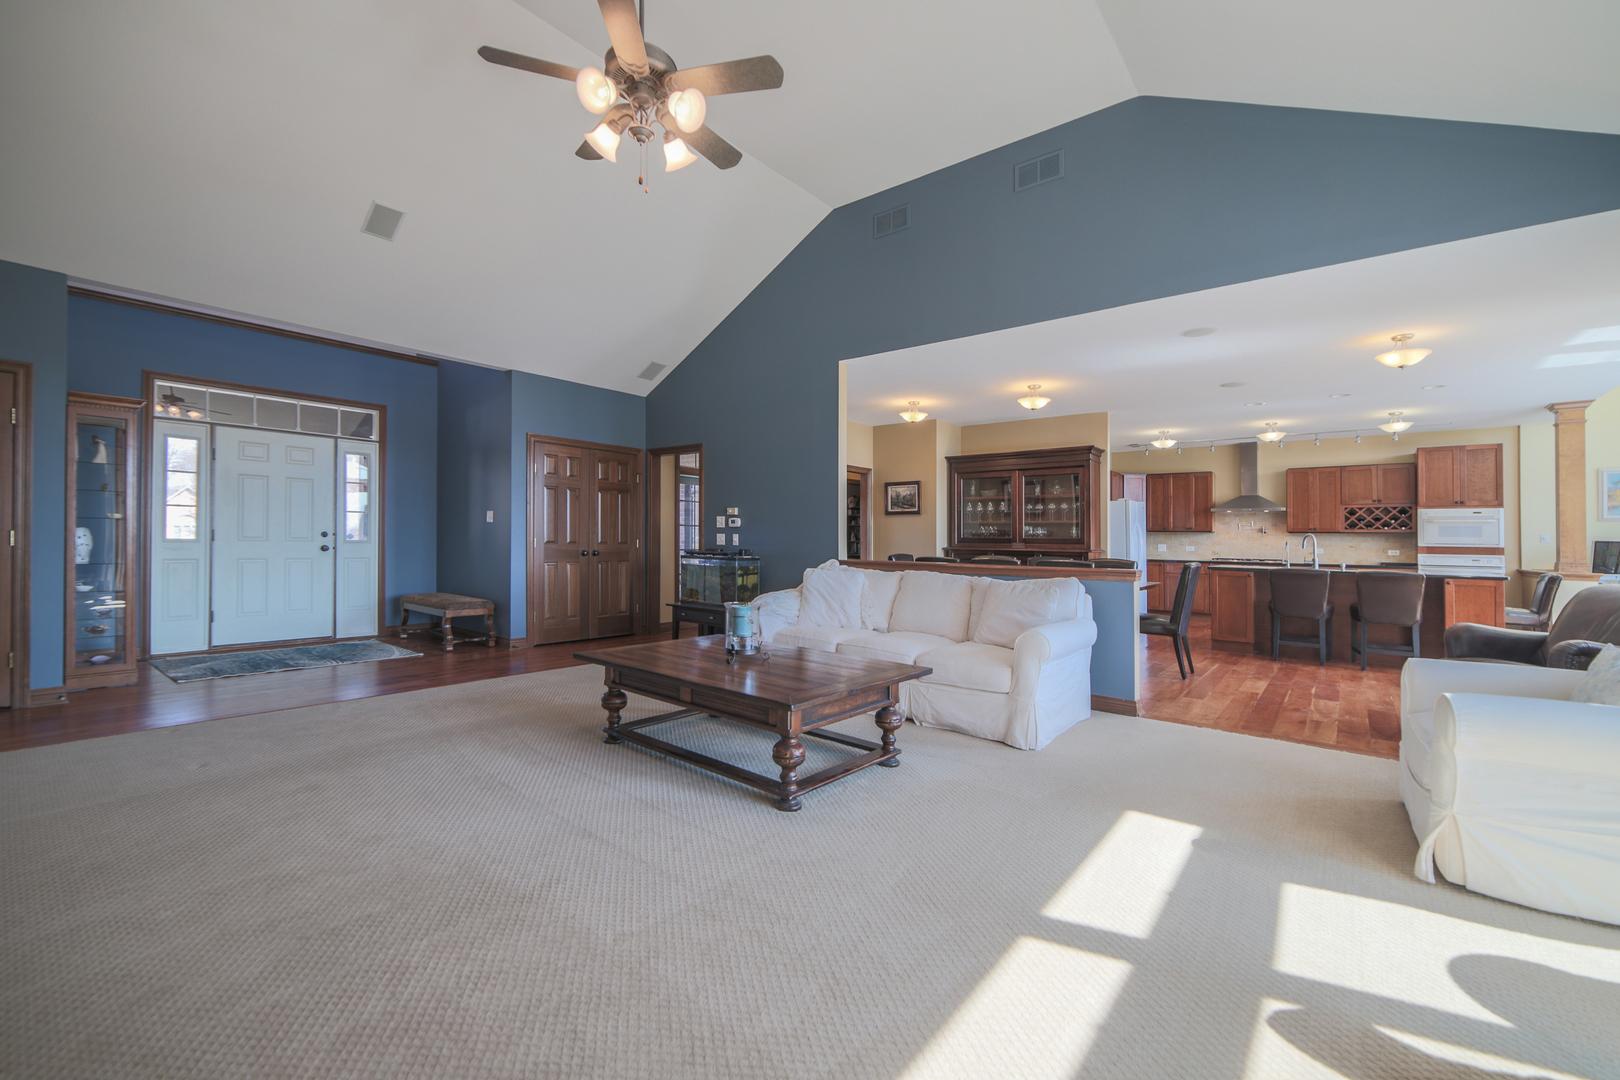 58 South Royal Oaks, Bristol, Illinois, 60512